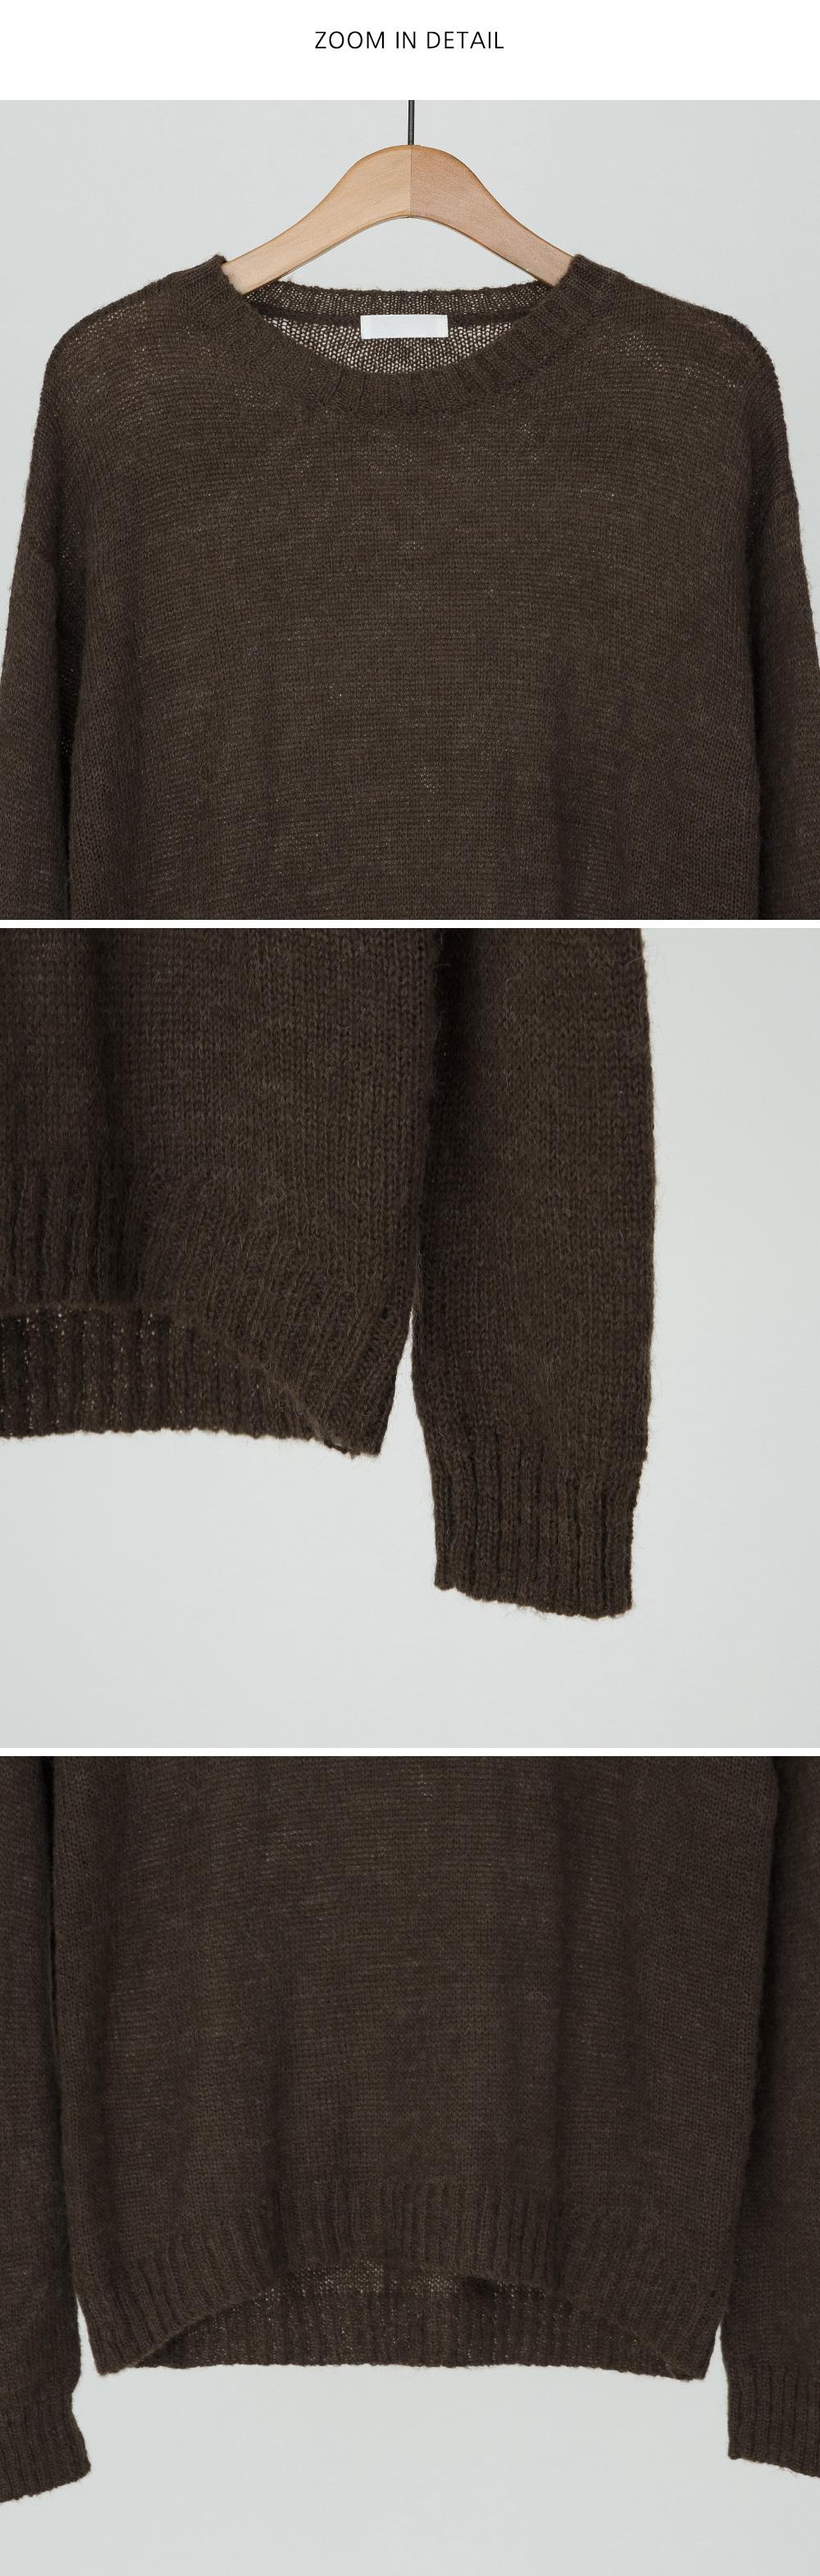 tone down round knit